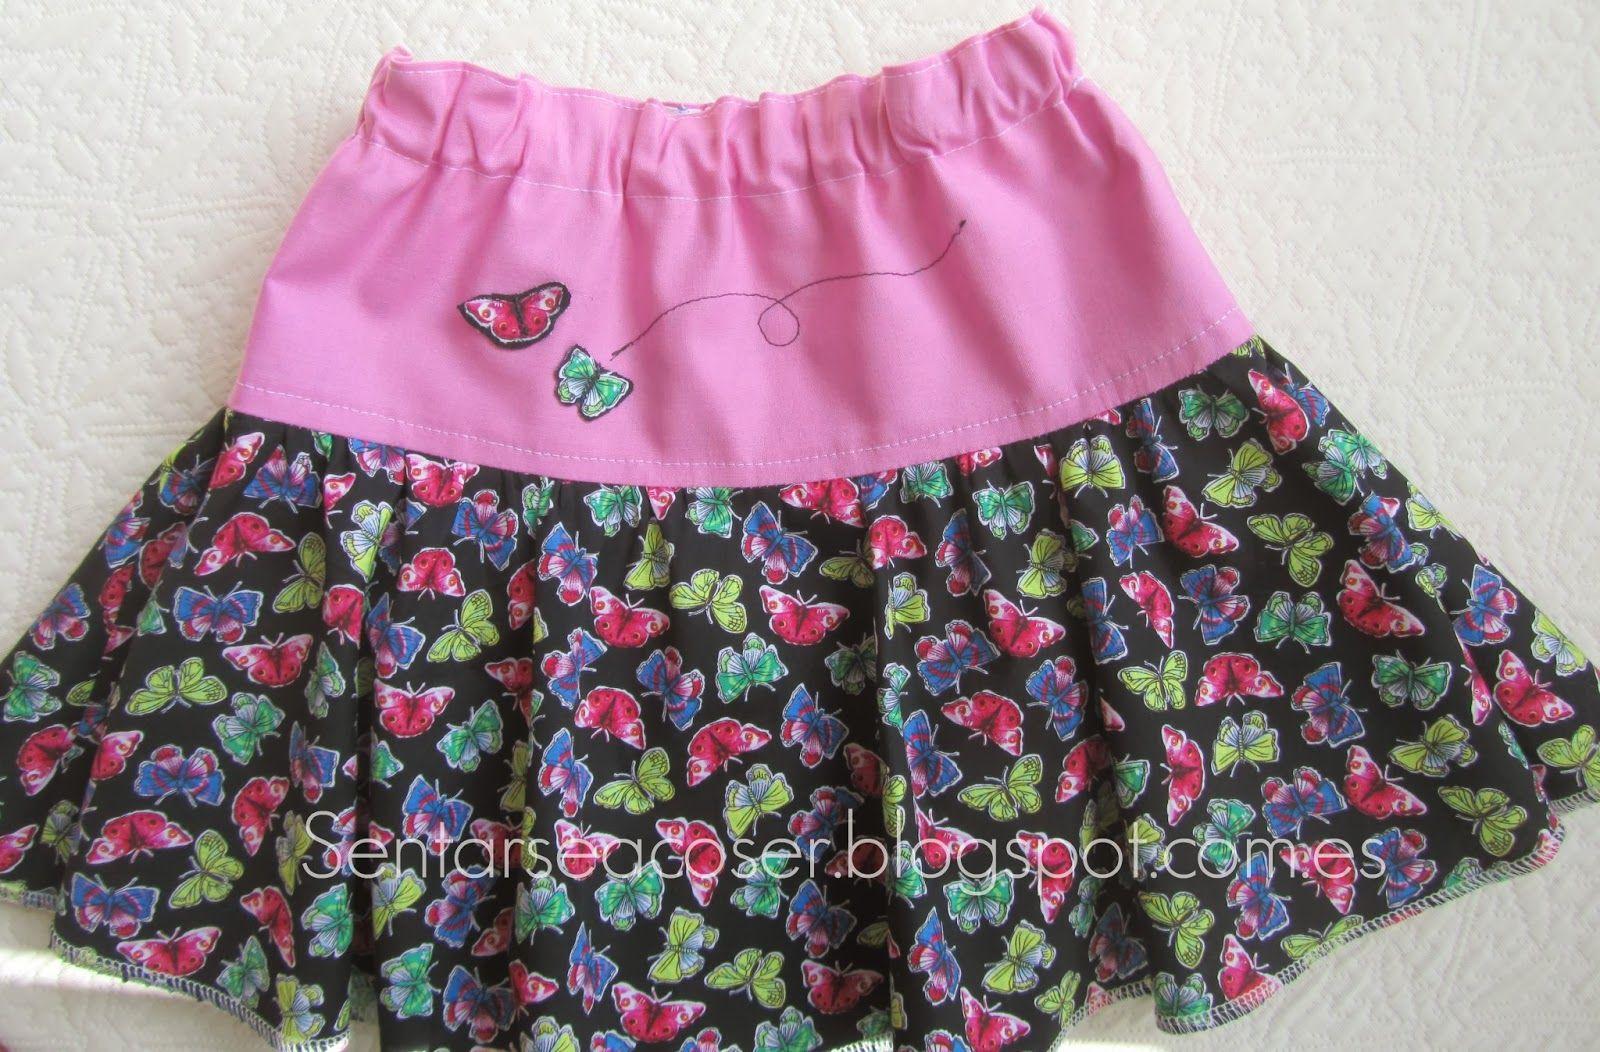 Sentarse a Coser: Tutorial falda de niña a capa y con canesú. Fácil ...